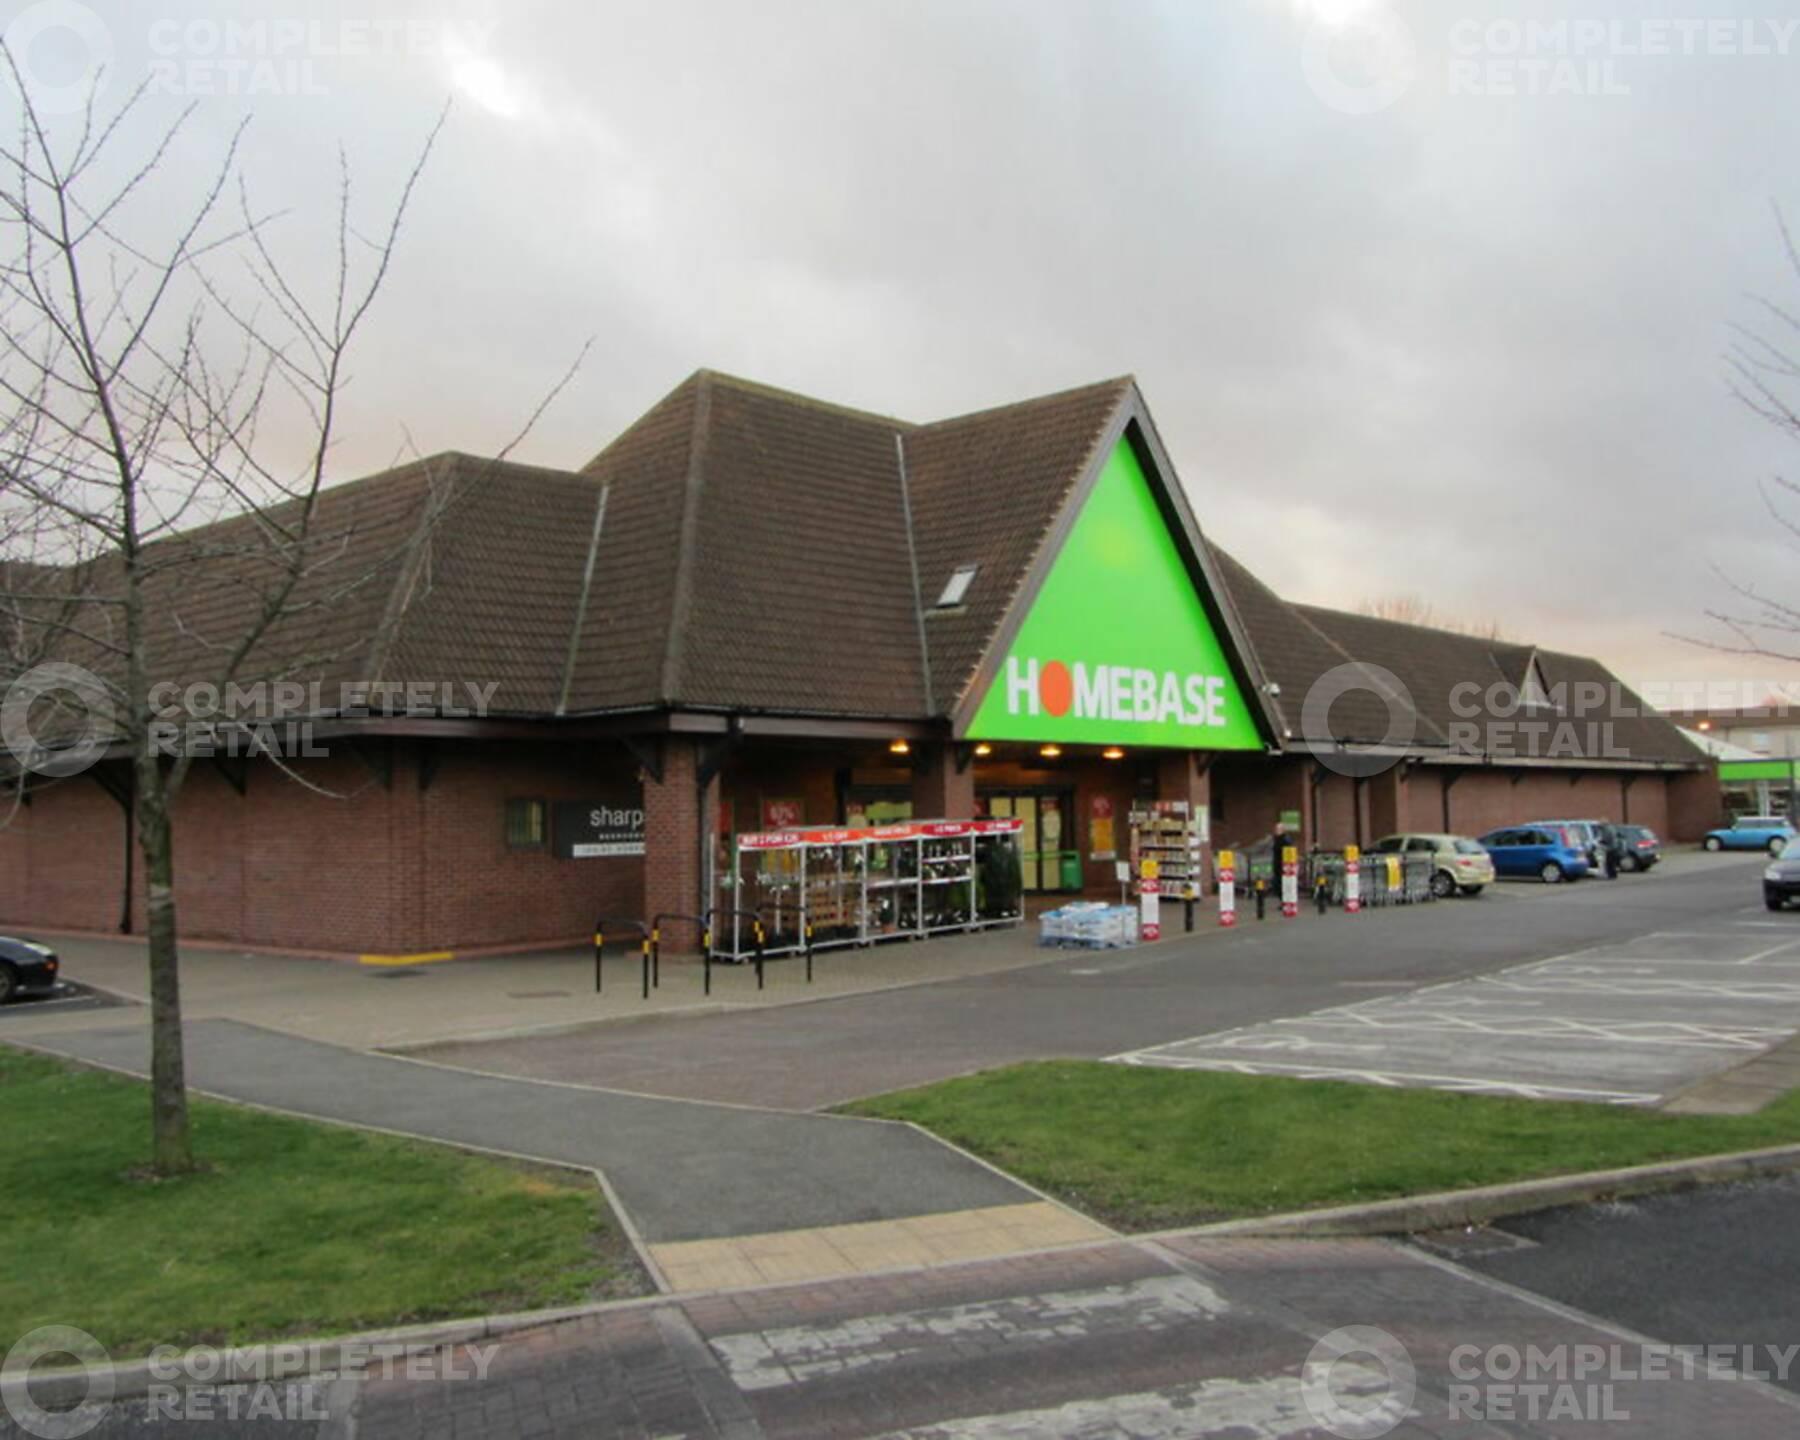 Madford Retail Park